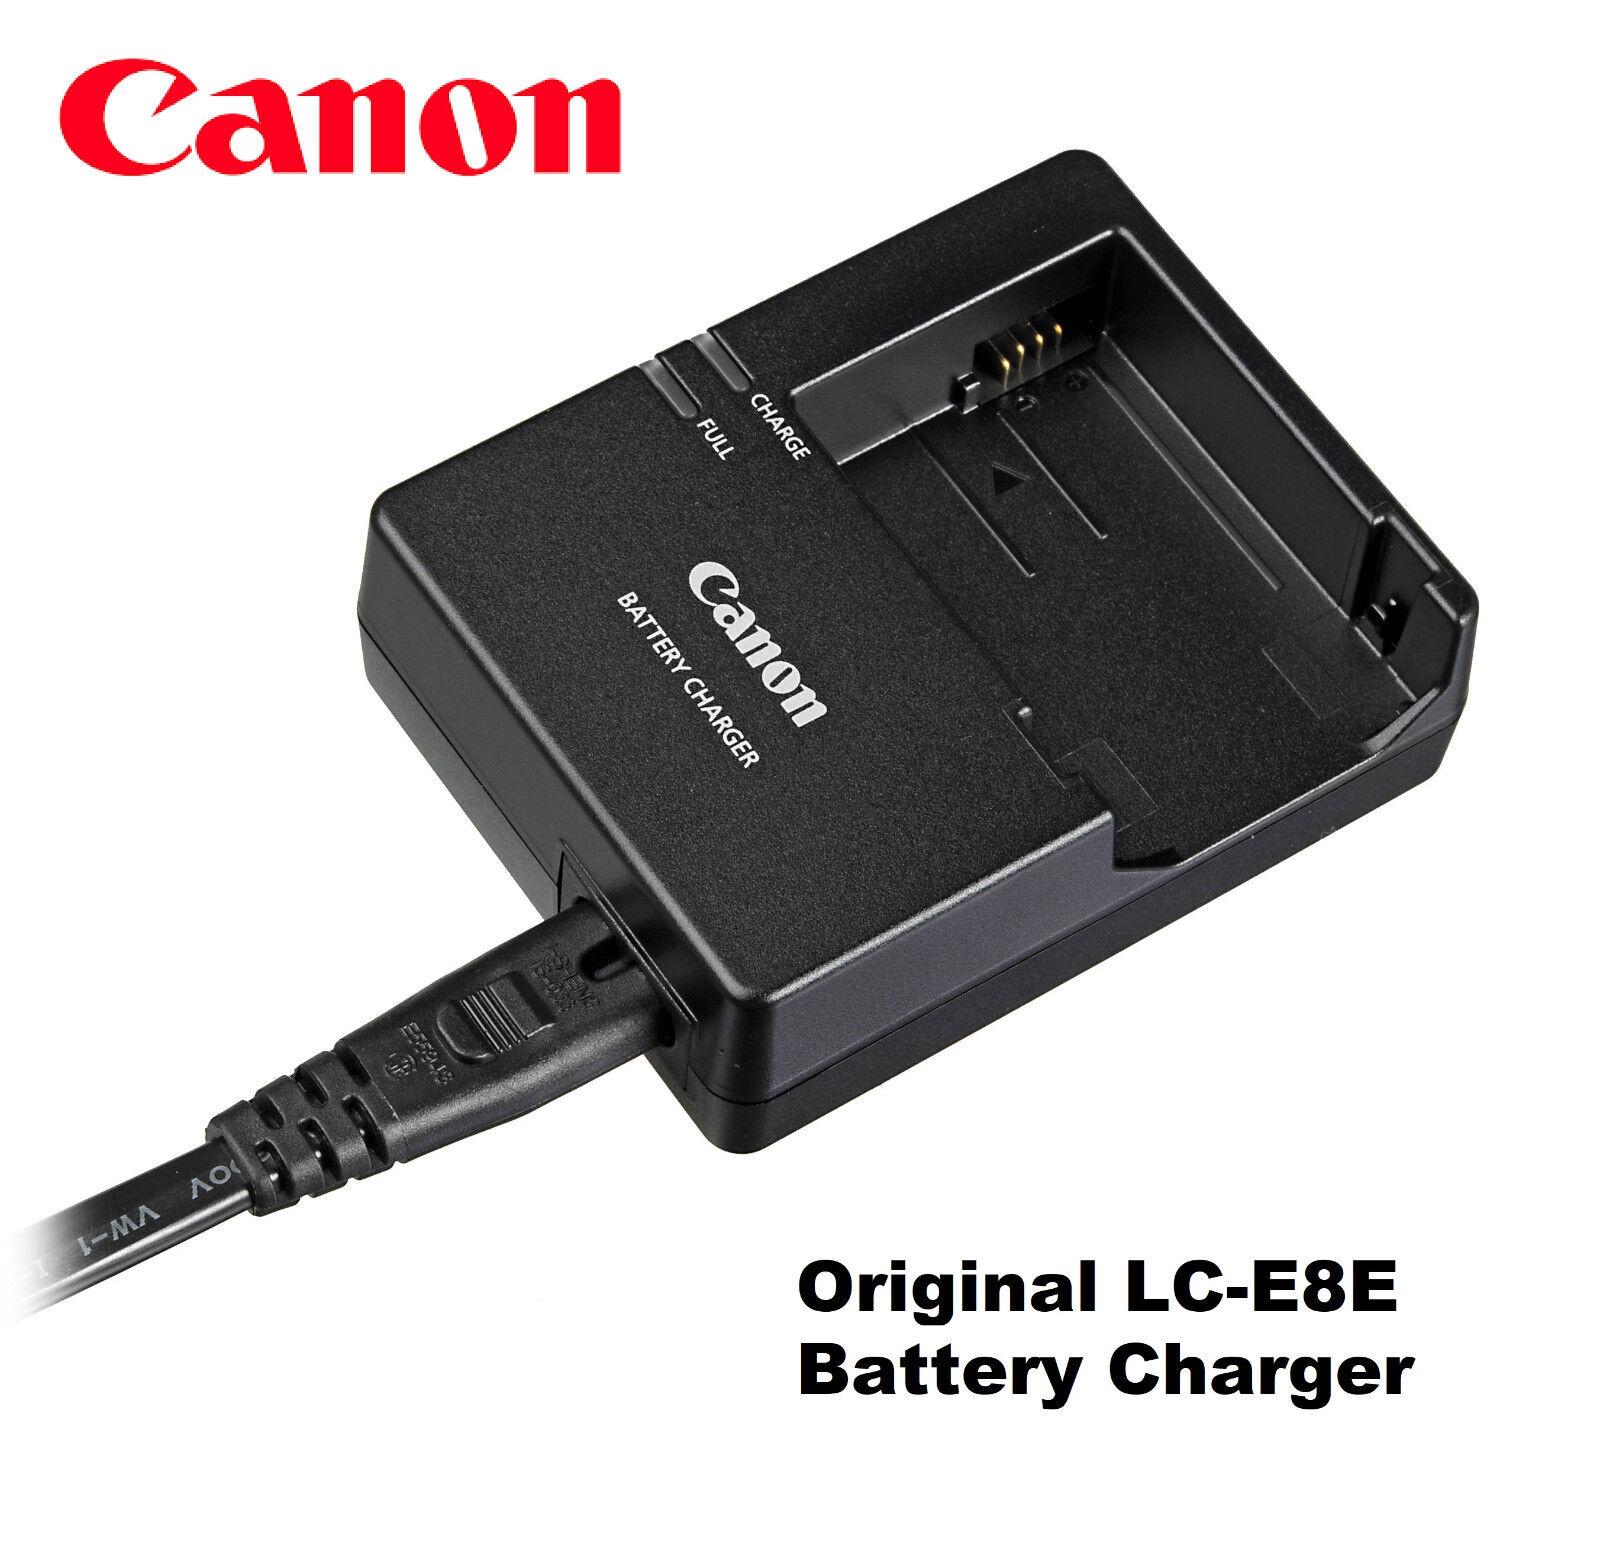 Original OEM Canon EOS Rebel T3i T4i T5i LC-E8 LC-E8E Charger for LP-E8 Battery